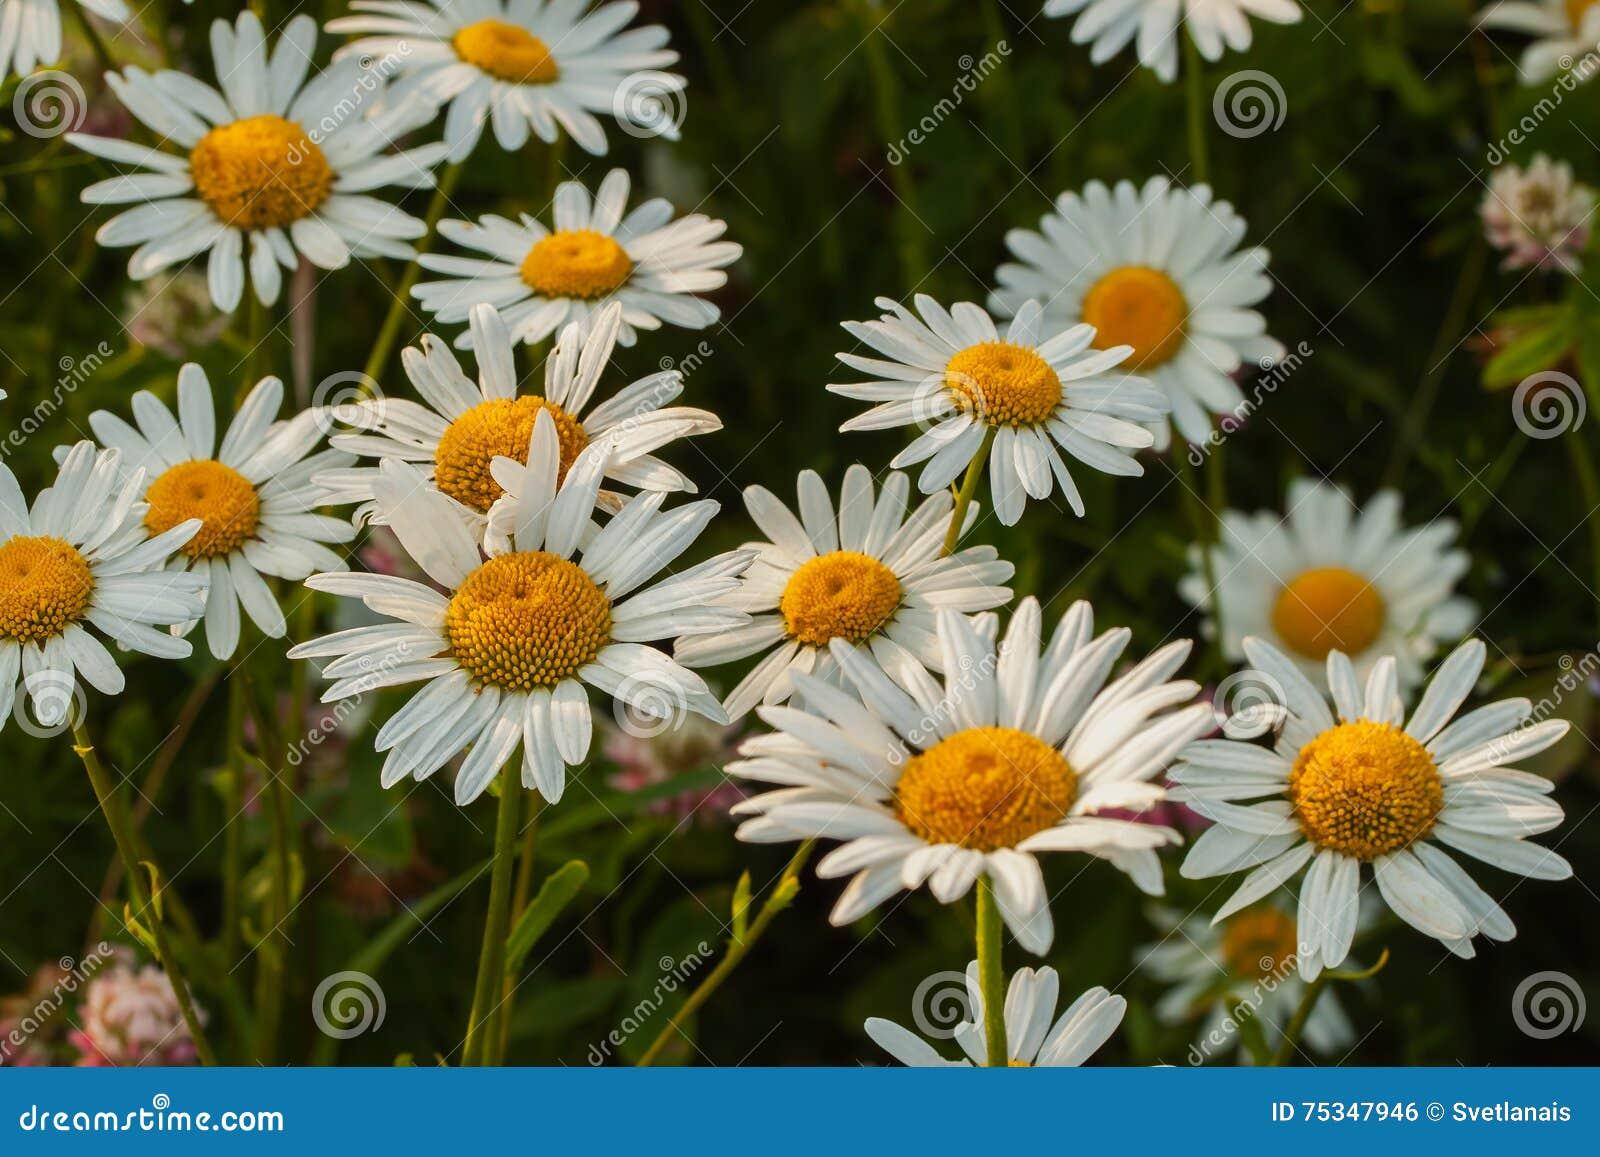 Daisy Charming Flower Symbol Of Beauty Nature Stock Photo Image